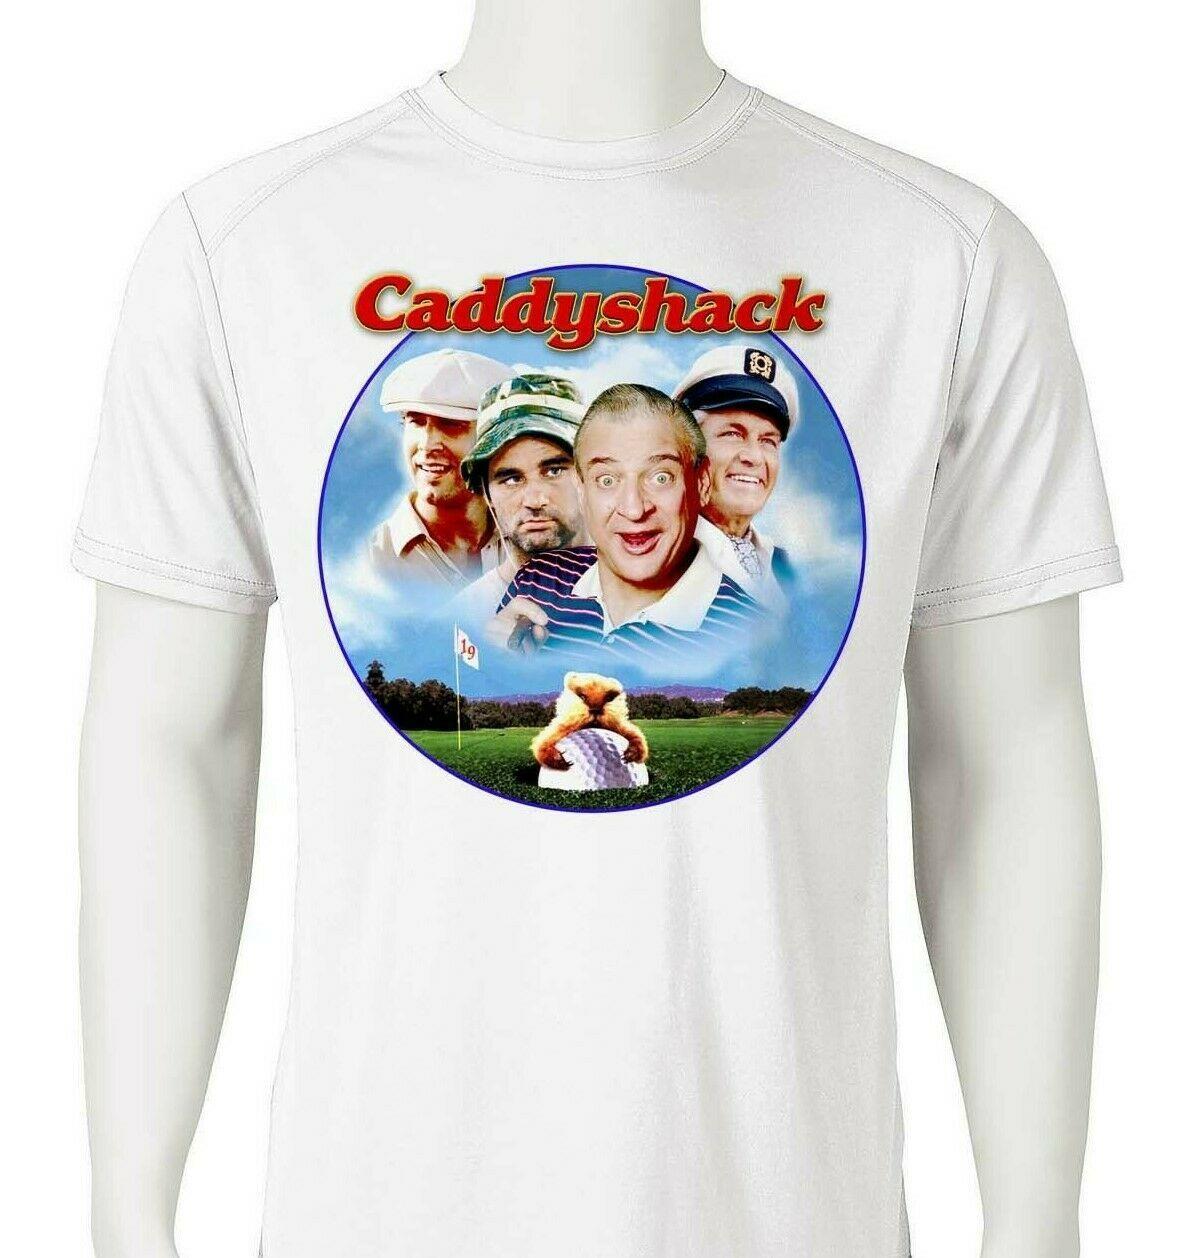 Caddyshack dri fit graphic t shirt moisture wicking retro 80s movie spf tee